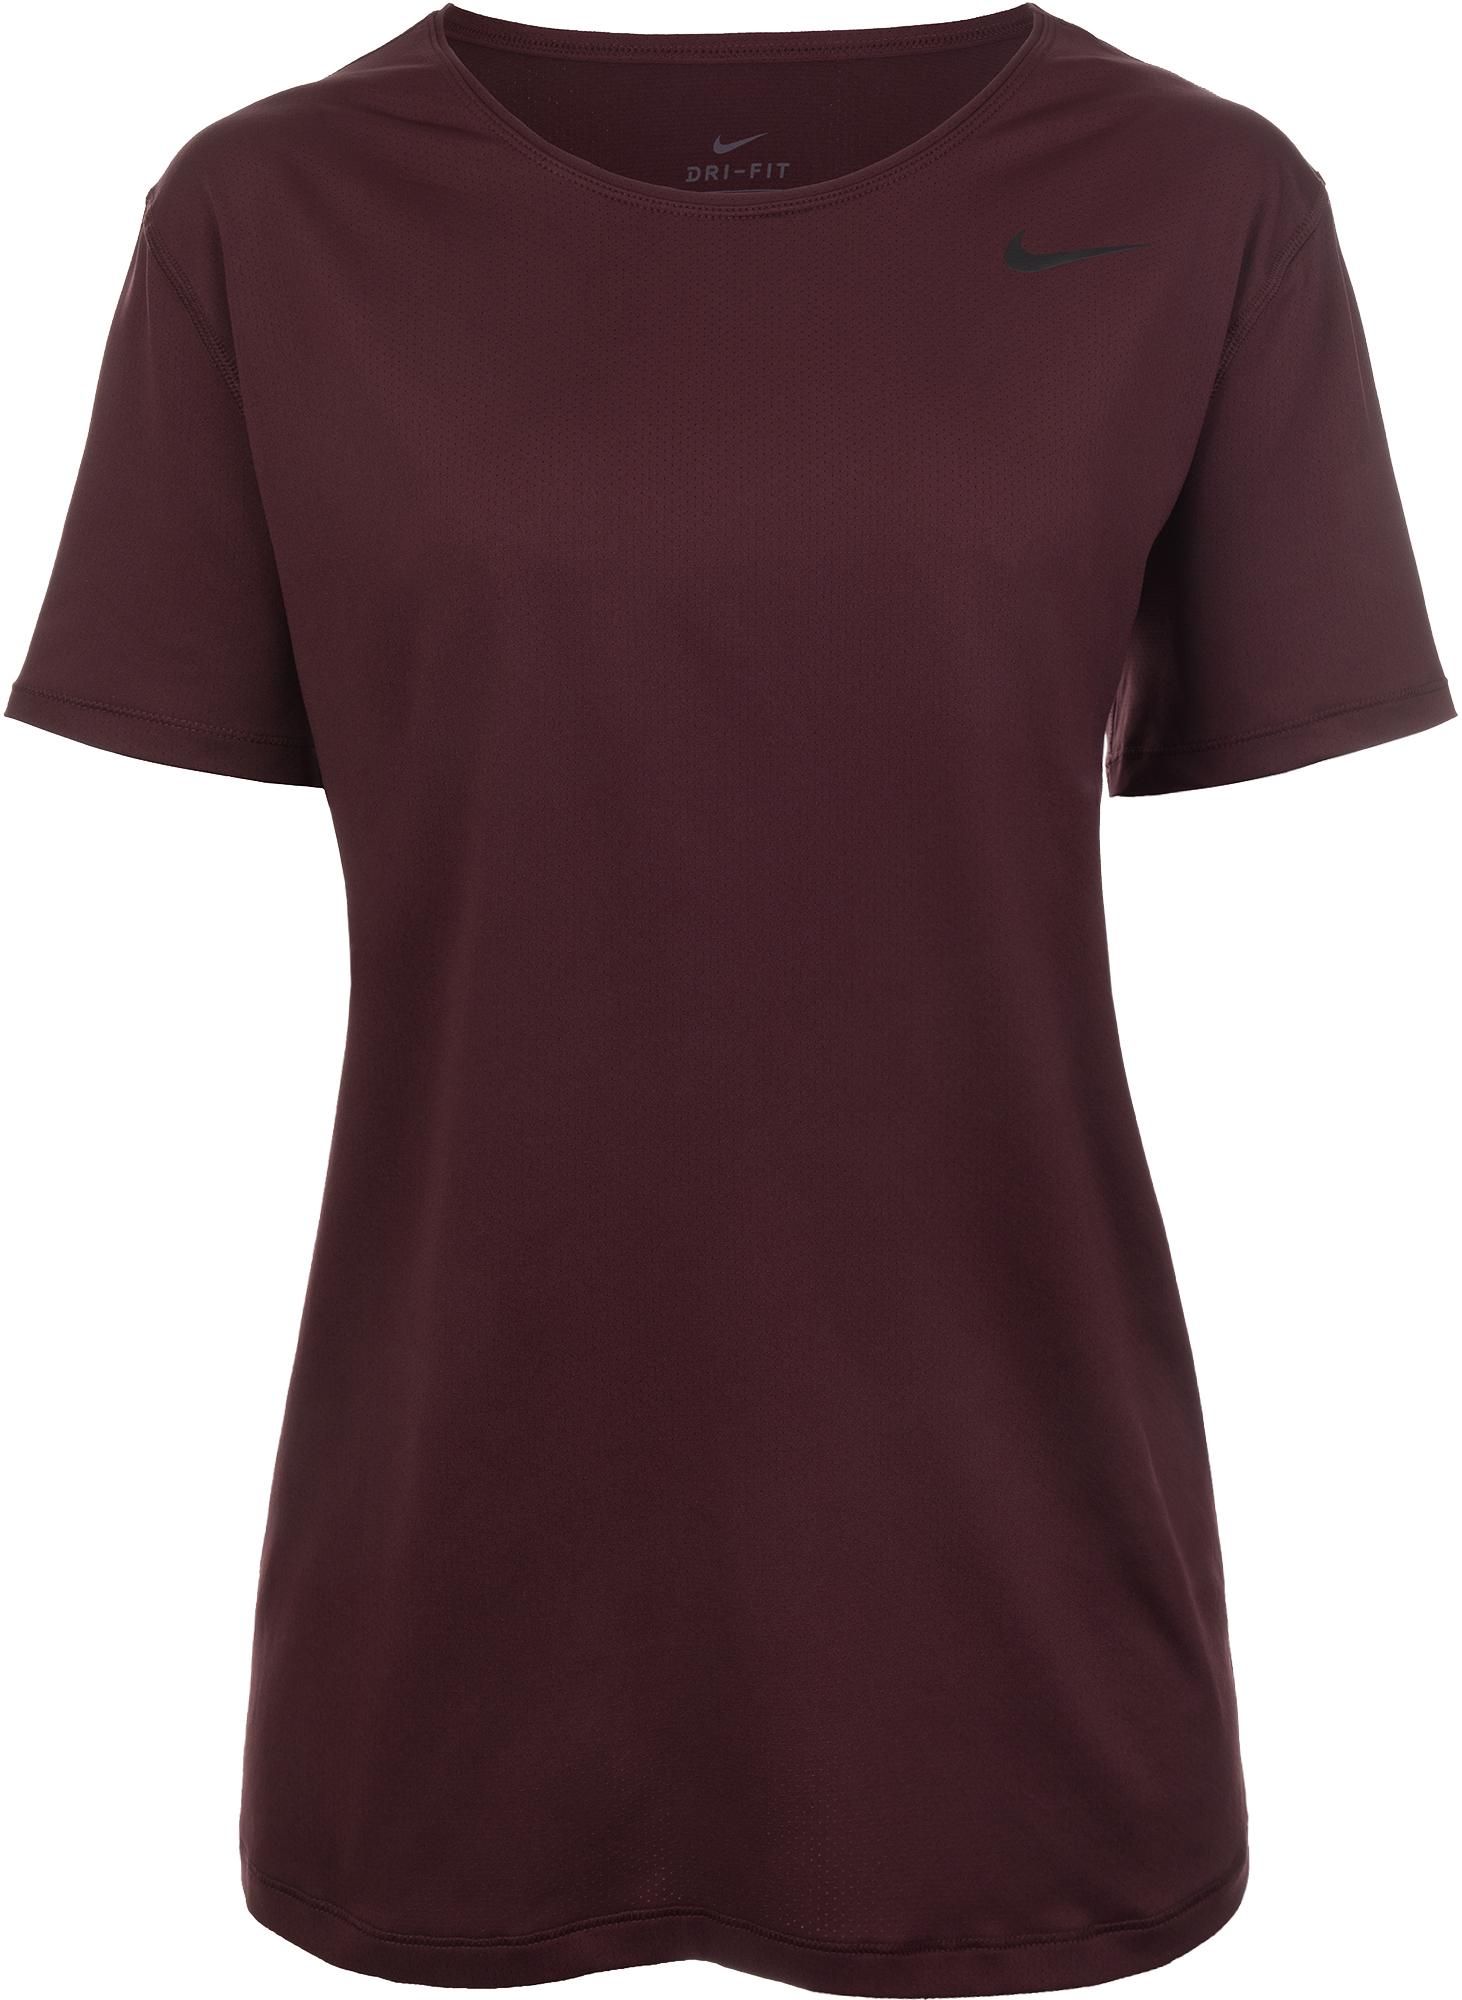 Nike Футболка женская Nike Pro, размер 56-58 футболка женская nike pro top цвет белый 889540 100 размер s 42 44